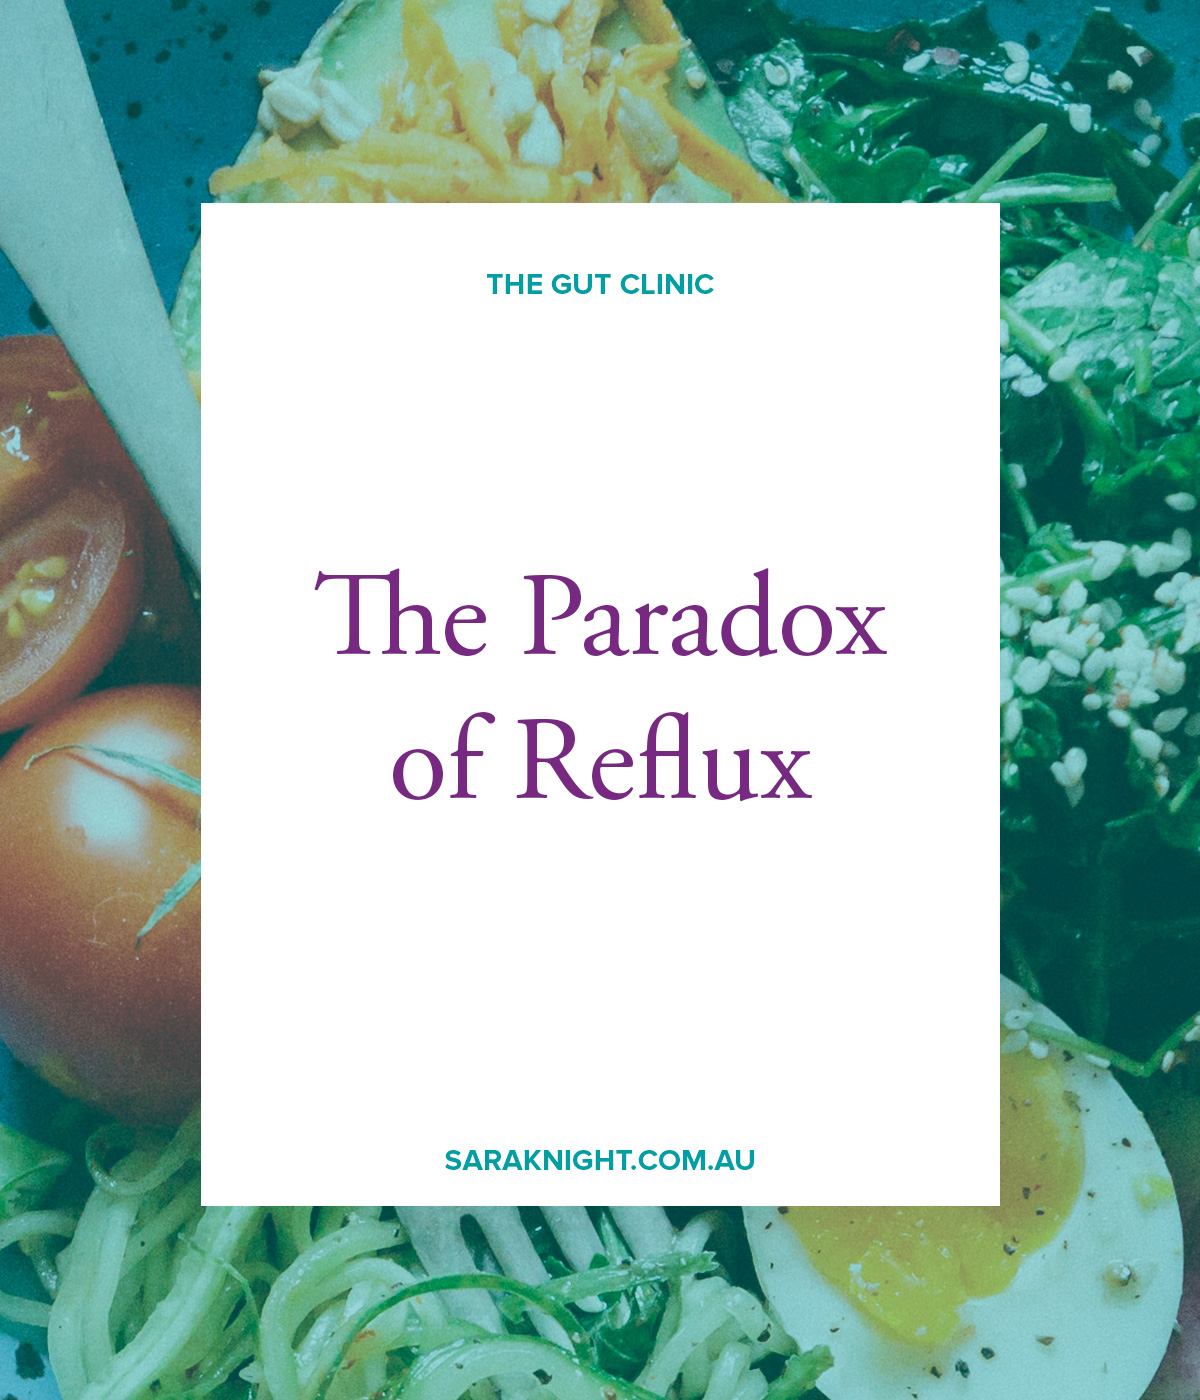 Sara Knight The Gut Clinic Newcastle Naturopath New Lambton The Paradox of Reflux